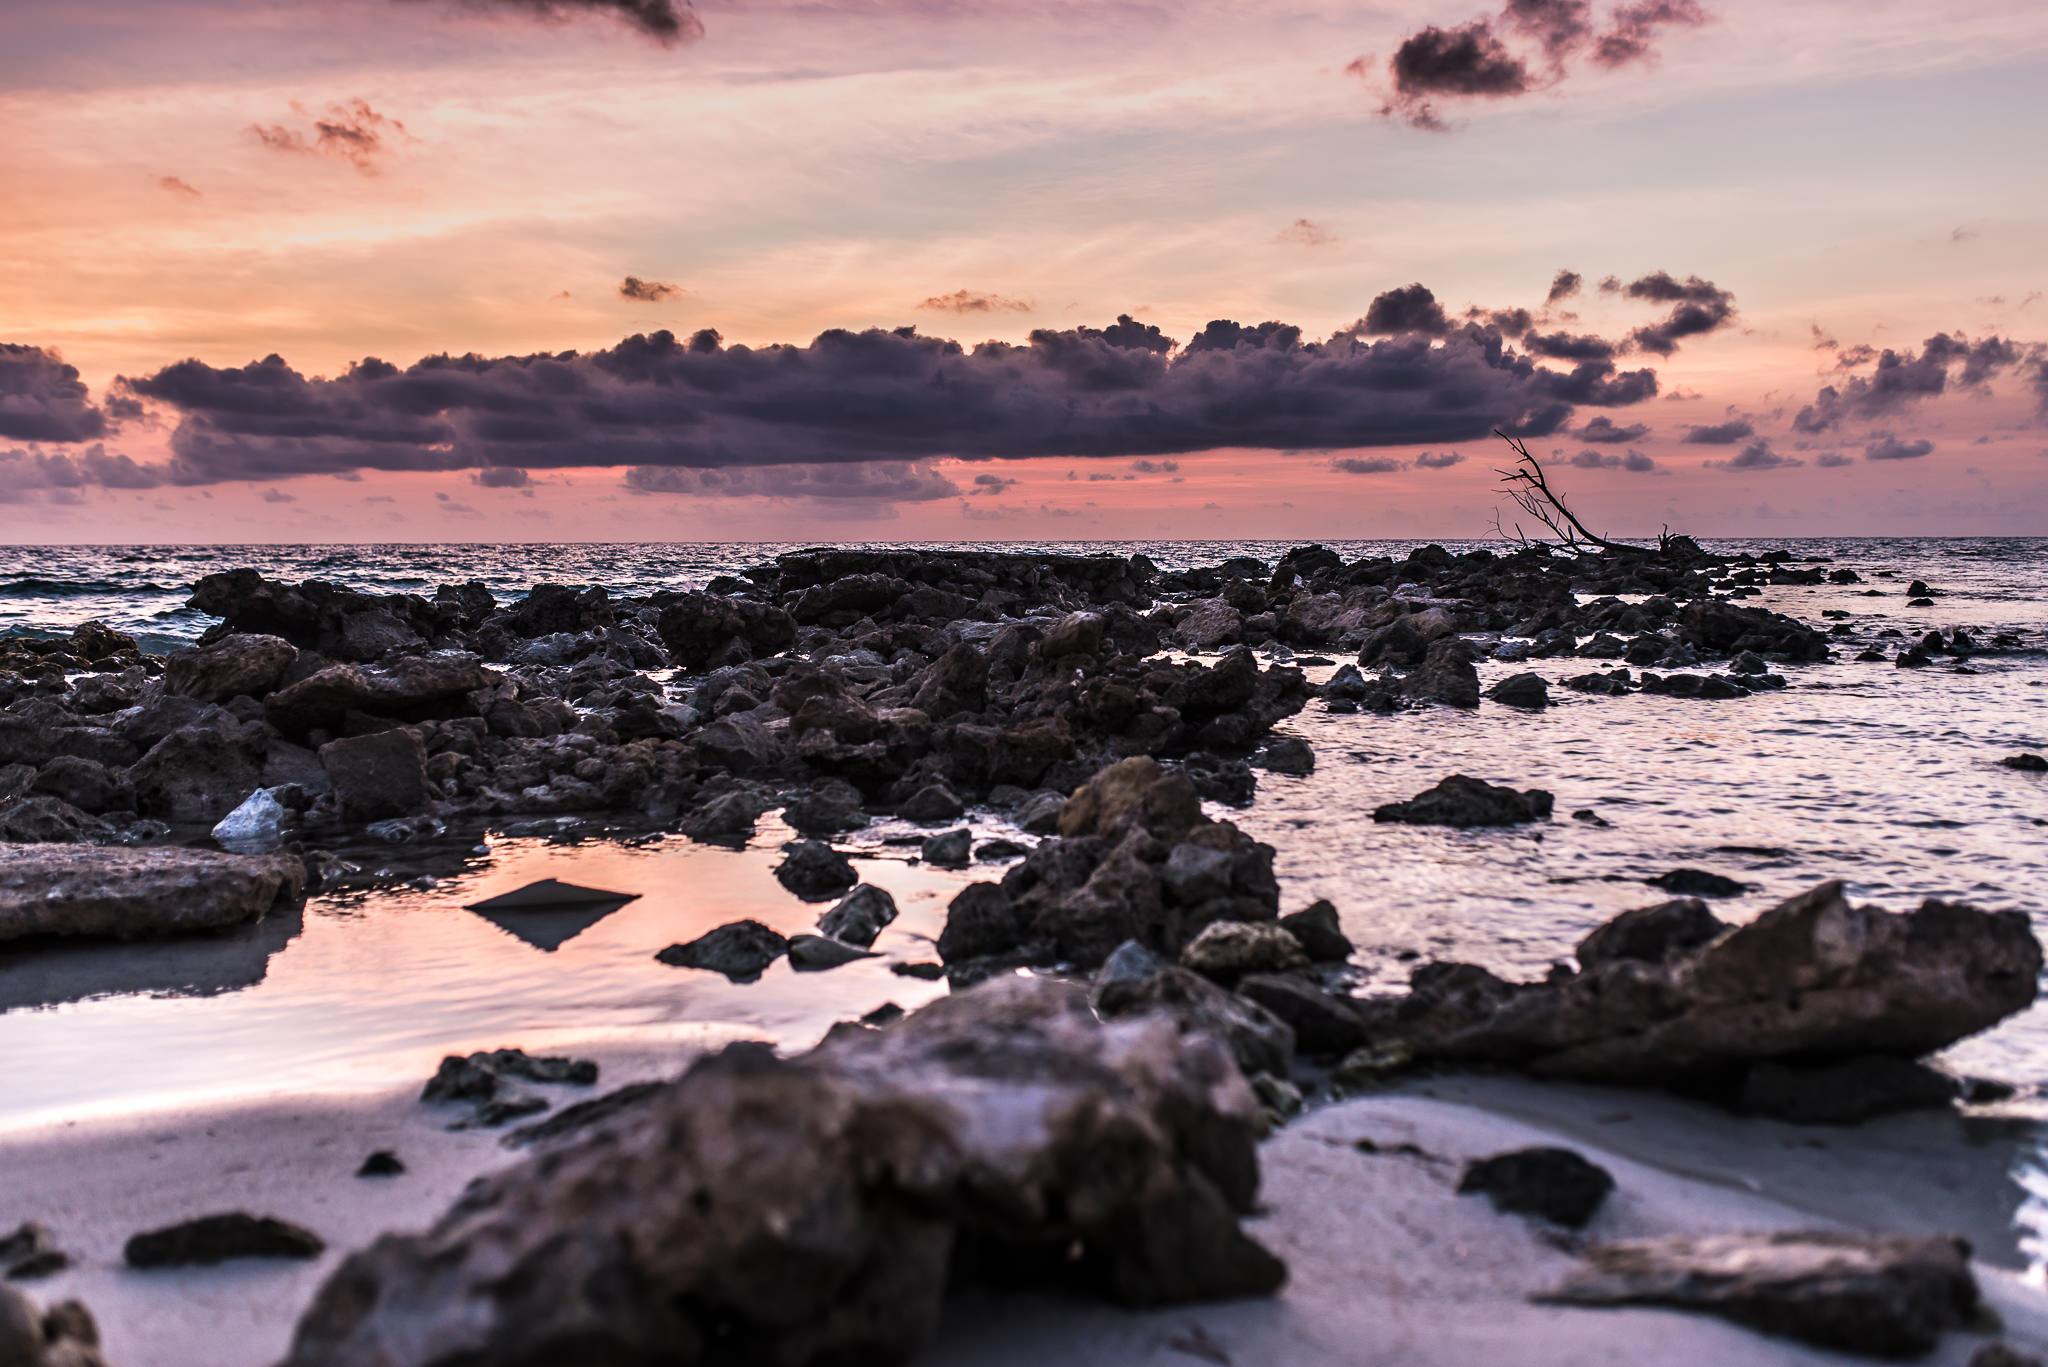 barco_sai_sanandres_colombia_caribe_fisherman_haya_sky_blue_isla_island_00019.jpg